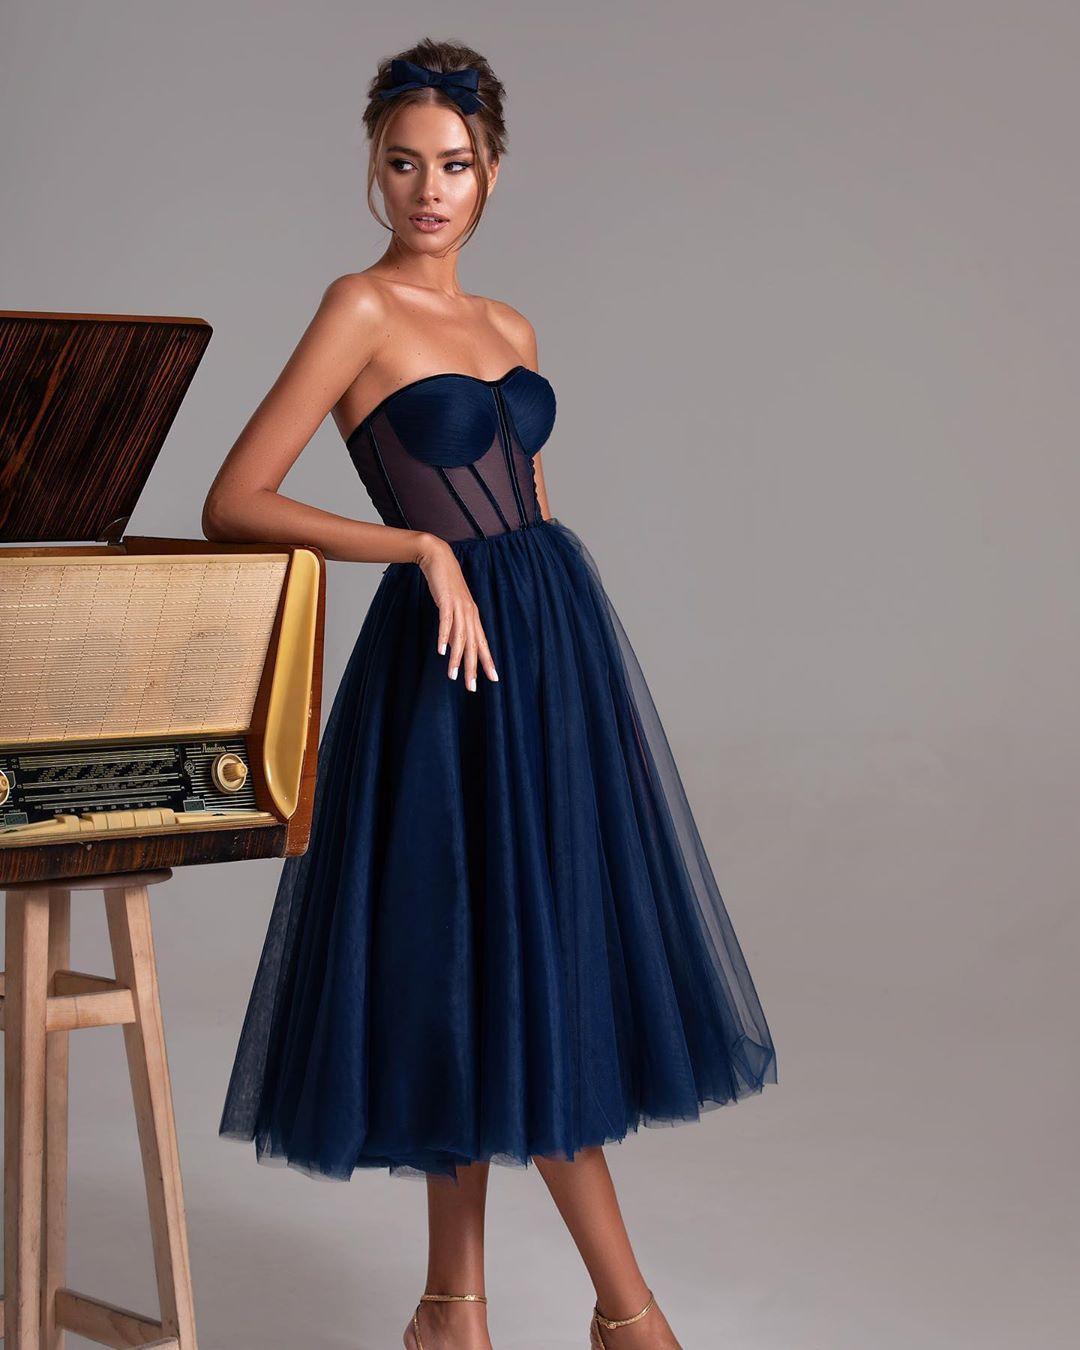 Elegant Party Dresses for Bustier